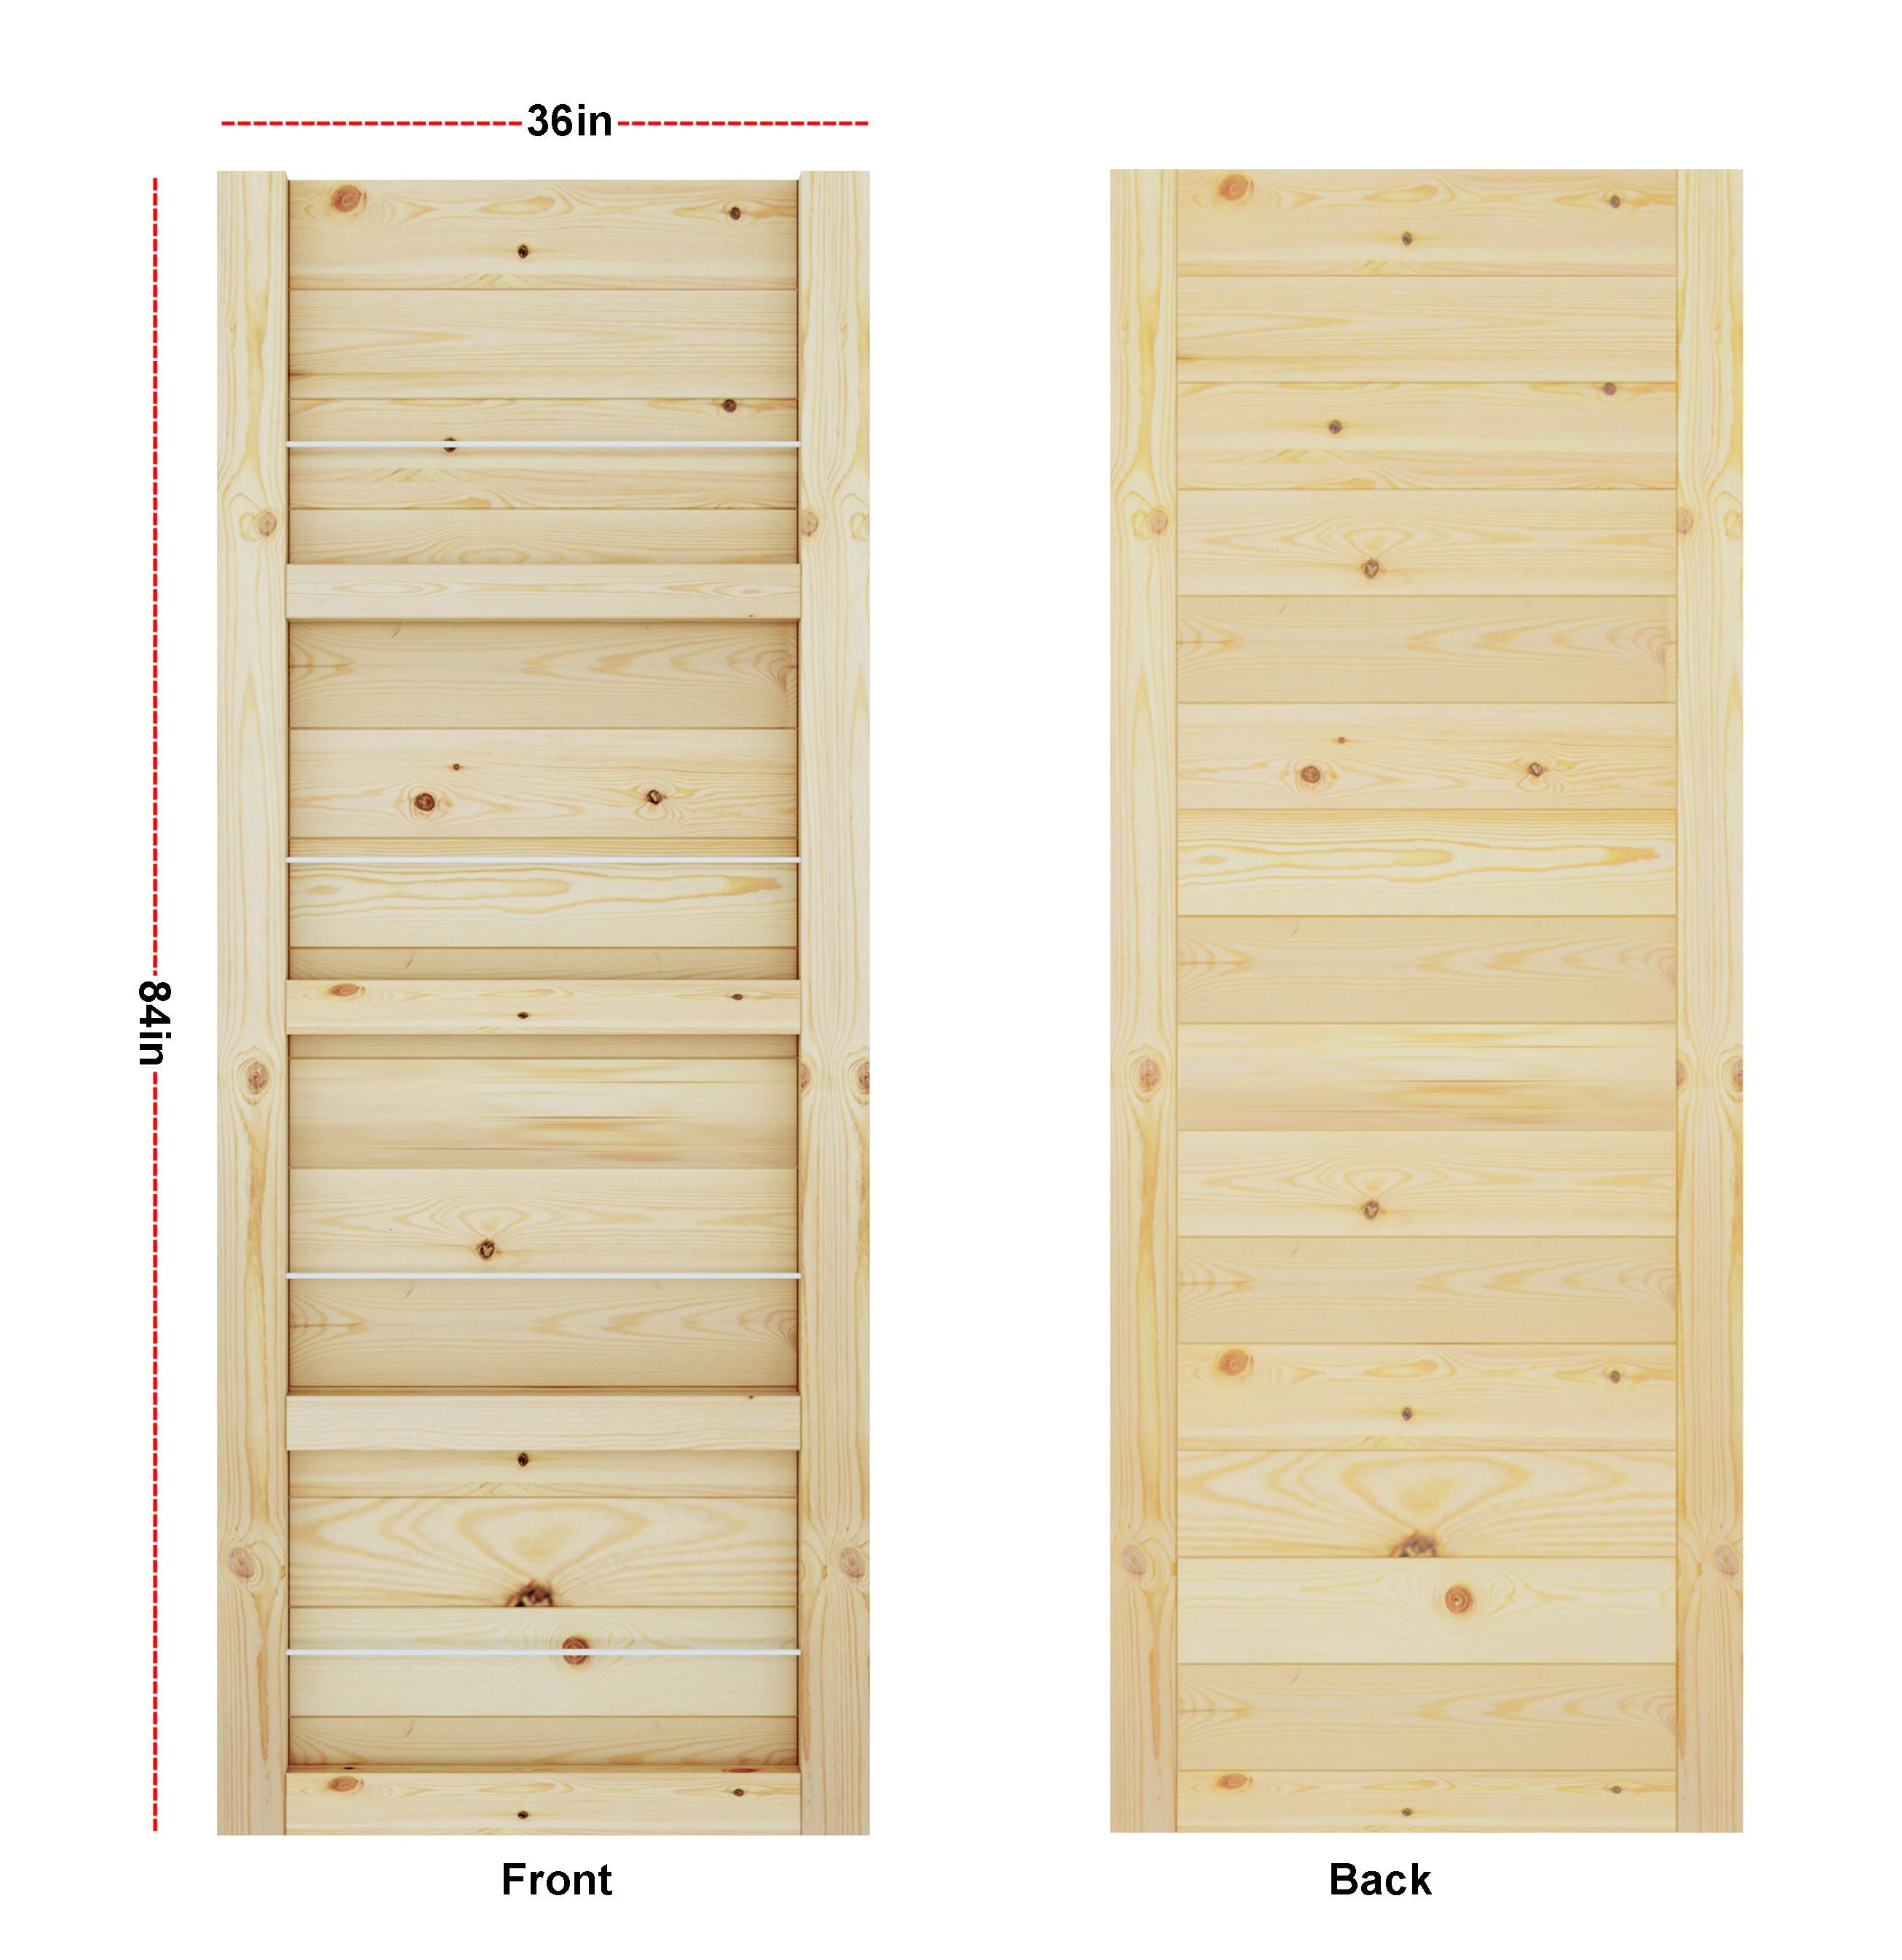 DIYHD Barn Door Slab Knotty Pine Wood Door Panel Loft Style 2 3/4